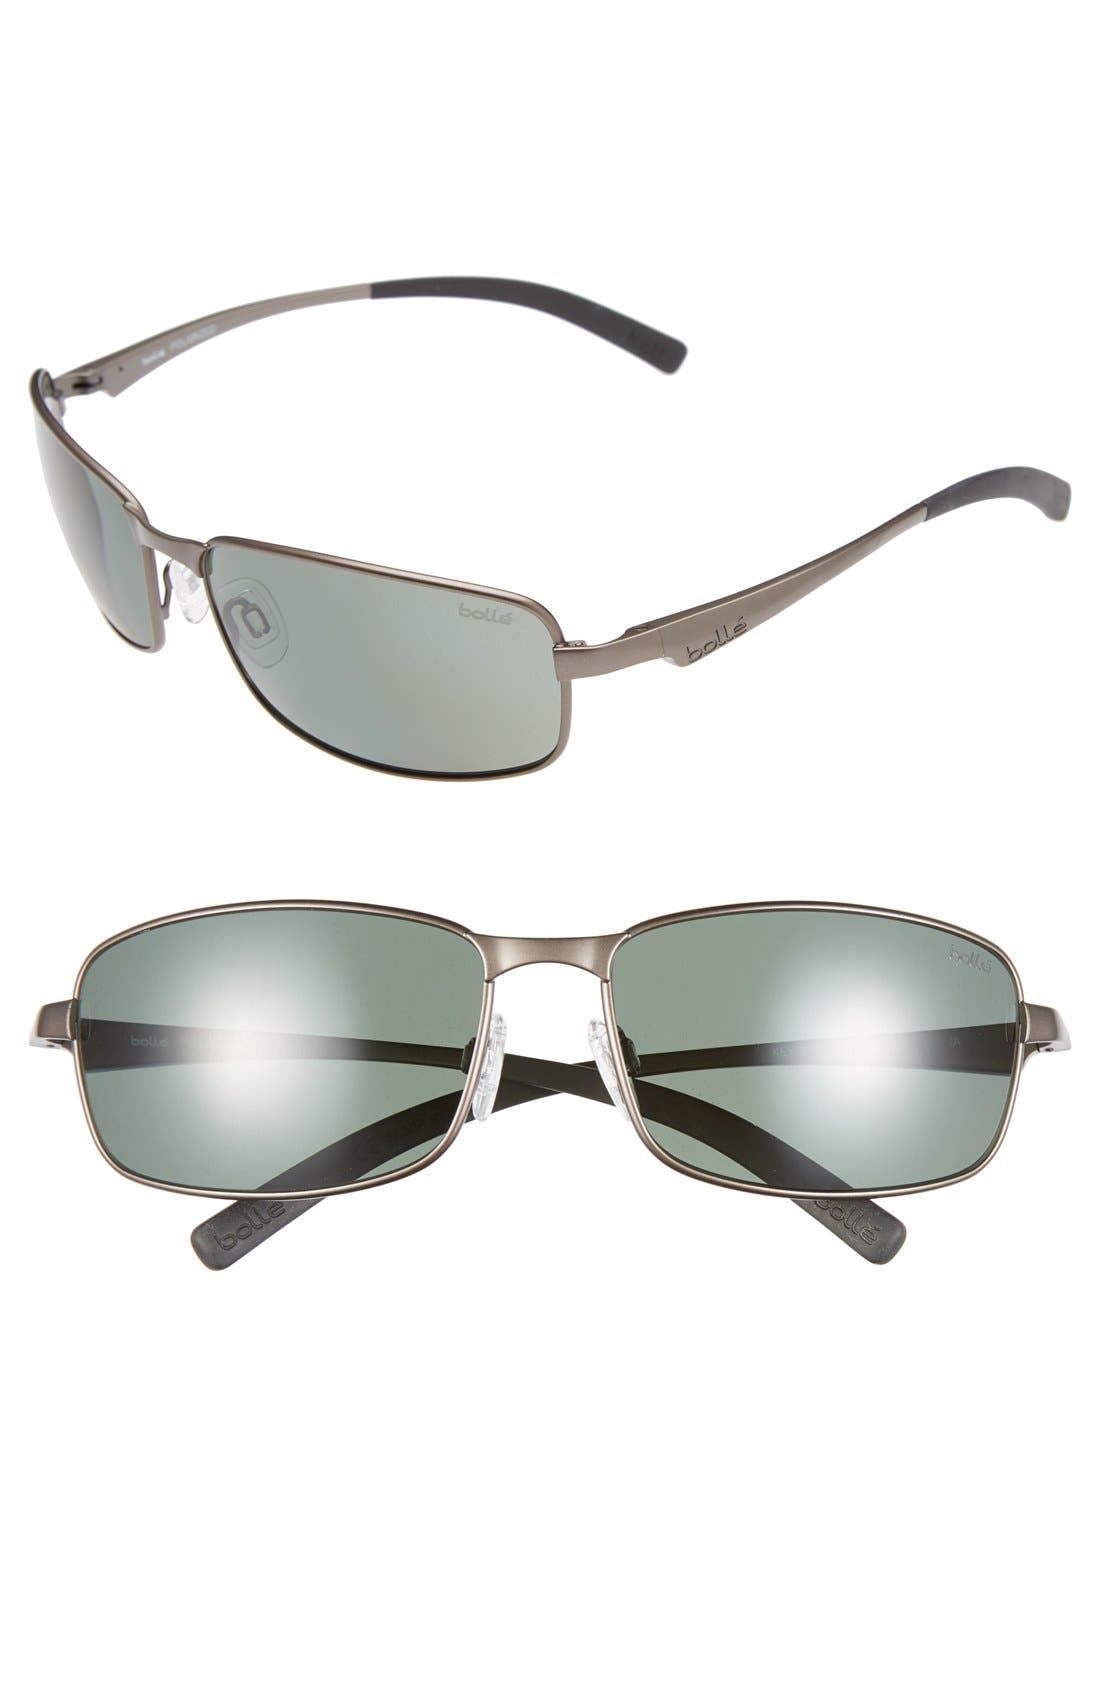 Alternate Image 1 Selected - Bolle 'Key West' 62mm Polarized Sunglasses